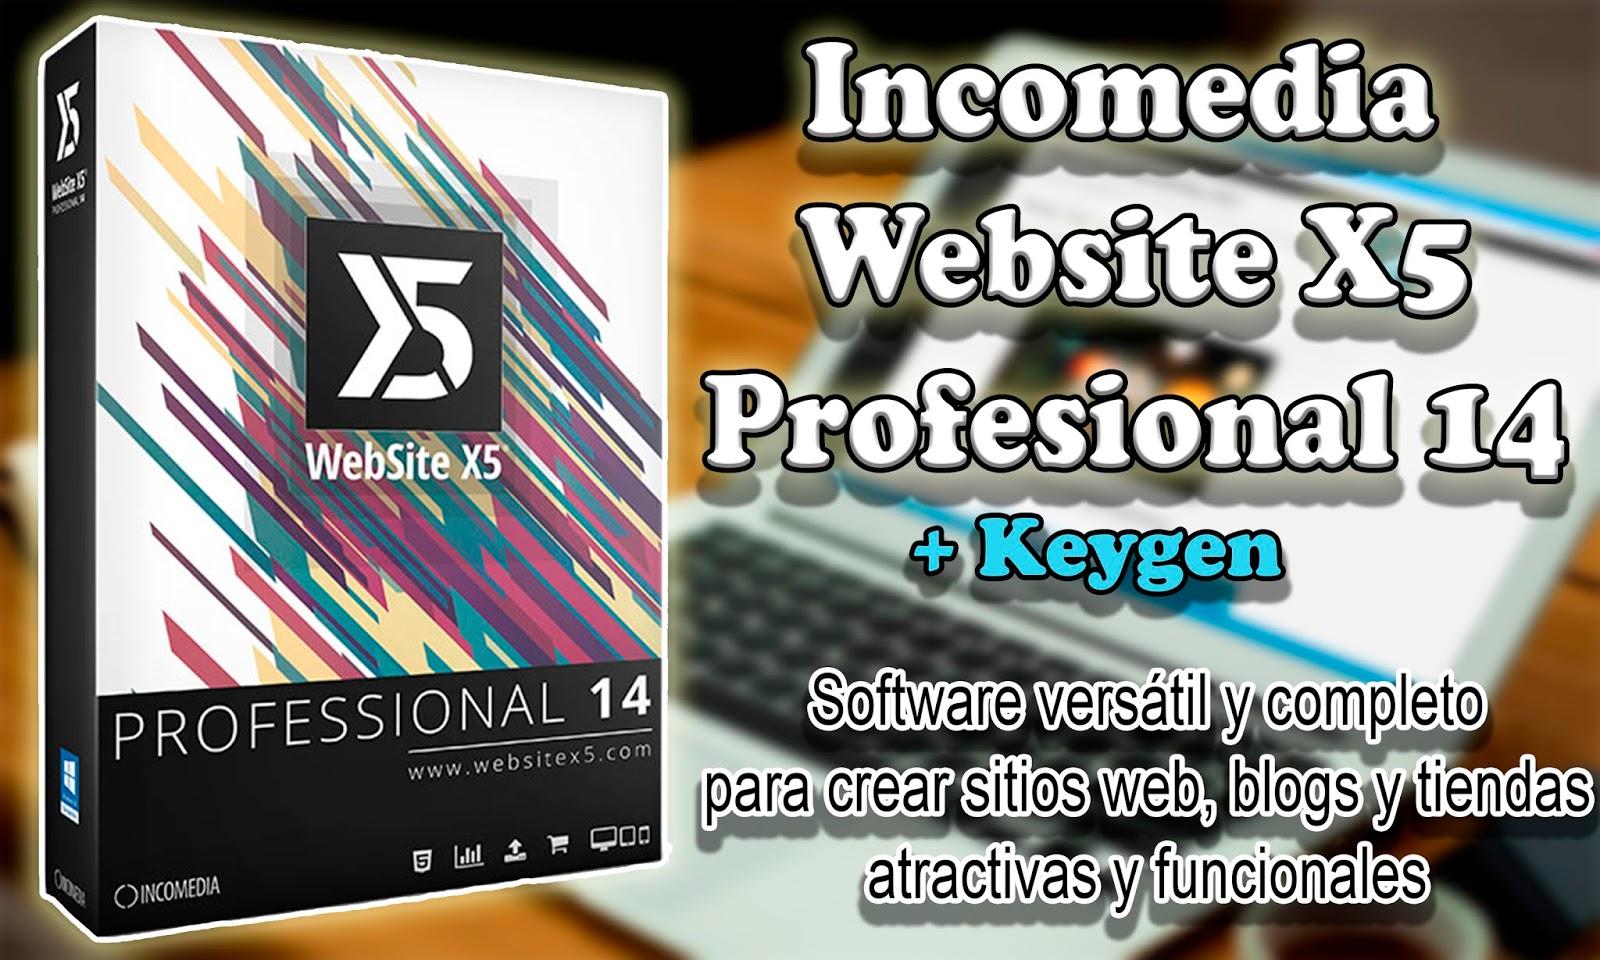 Incomedia WebSite X5 Professional 14.0.5.3   Programas y Utilidades PC